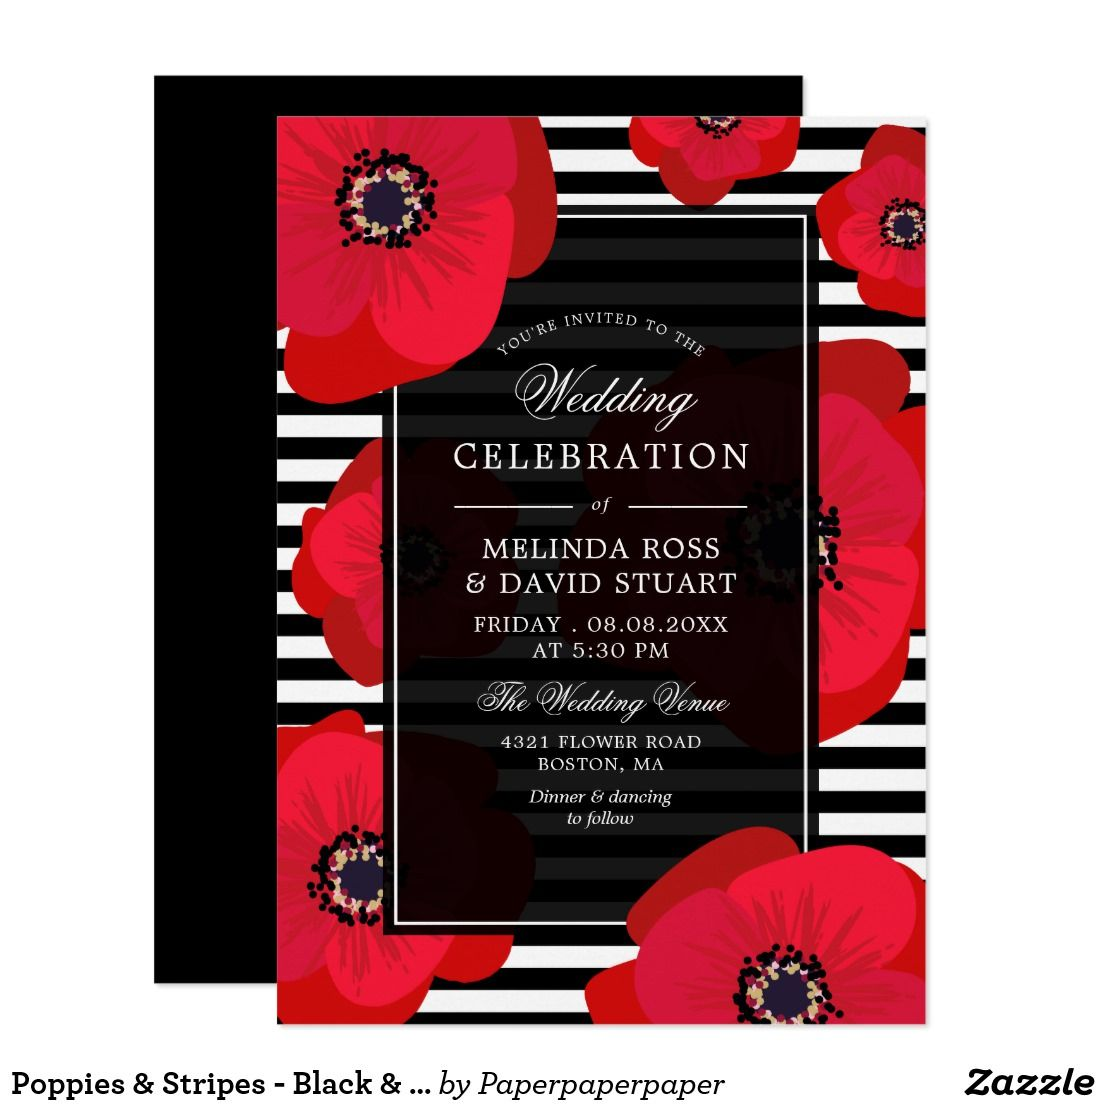 Poppies & Stripes - Black & Red Wedding Invitation   Pinterest ...